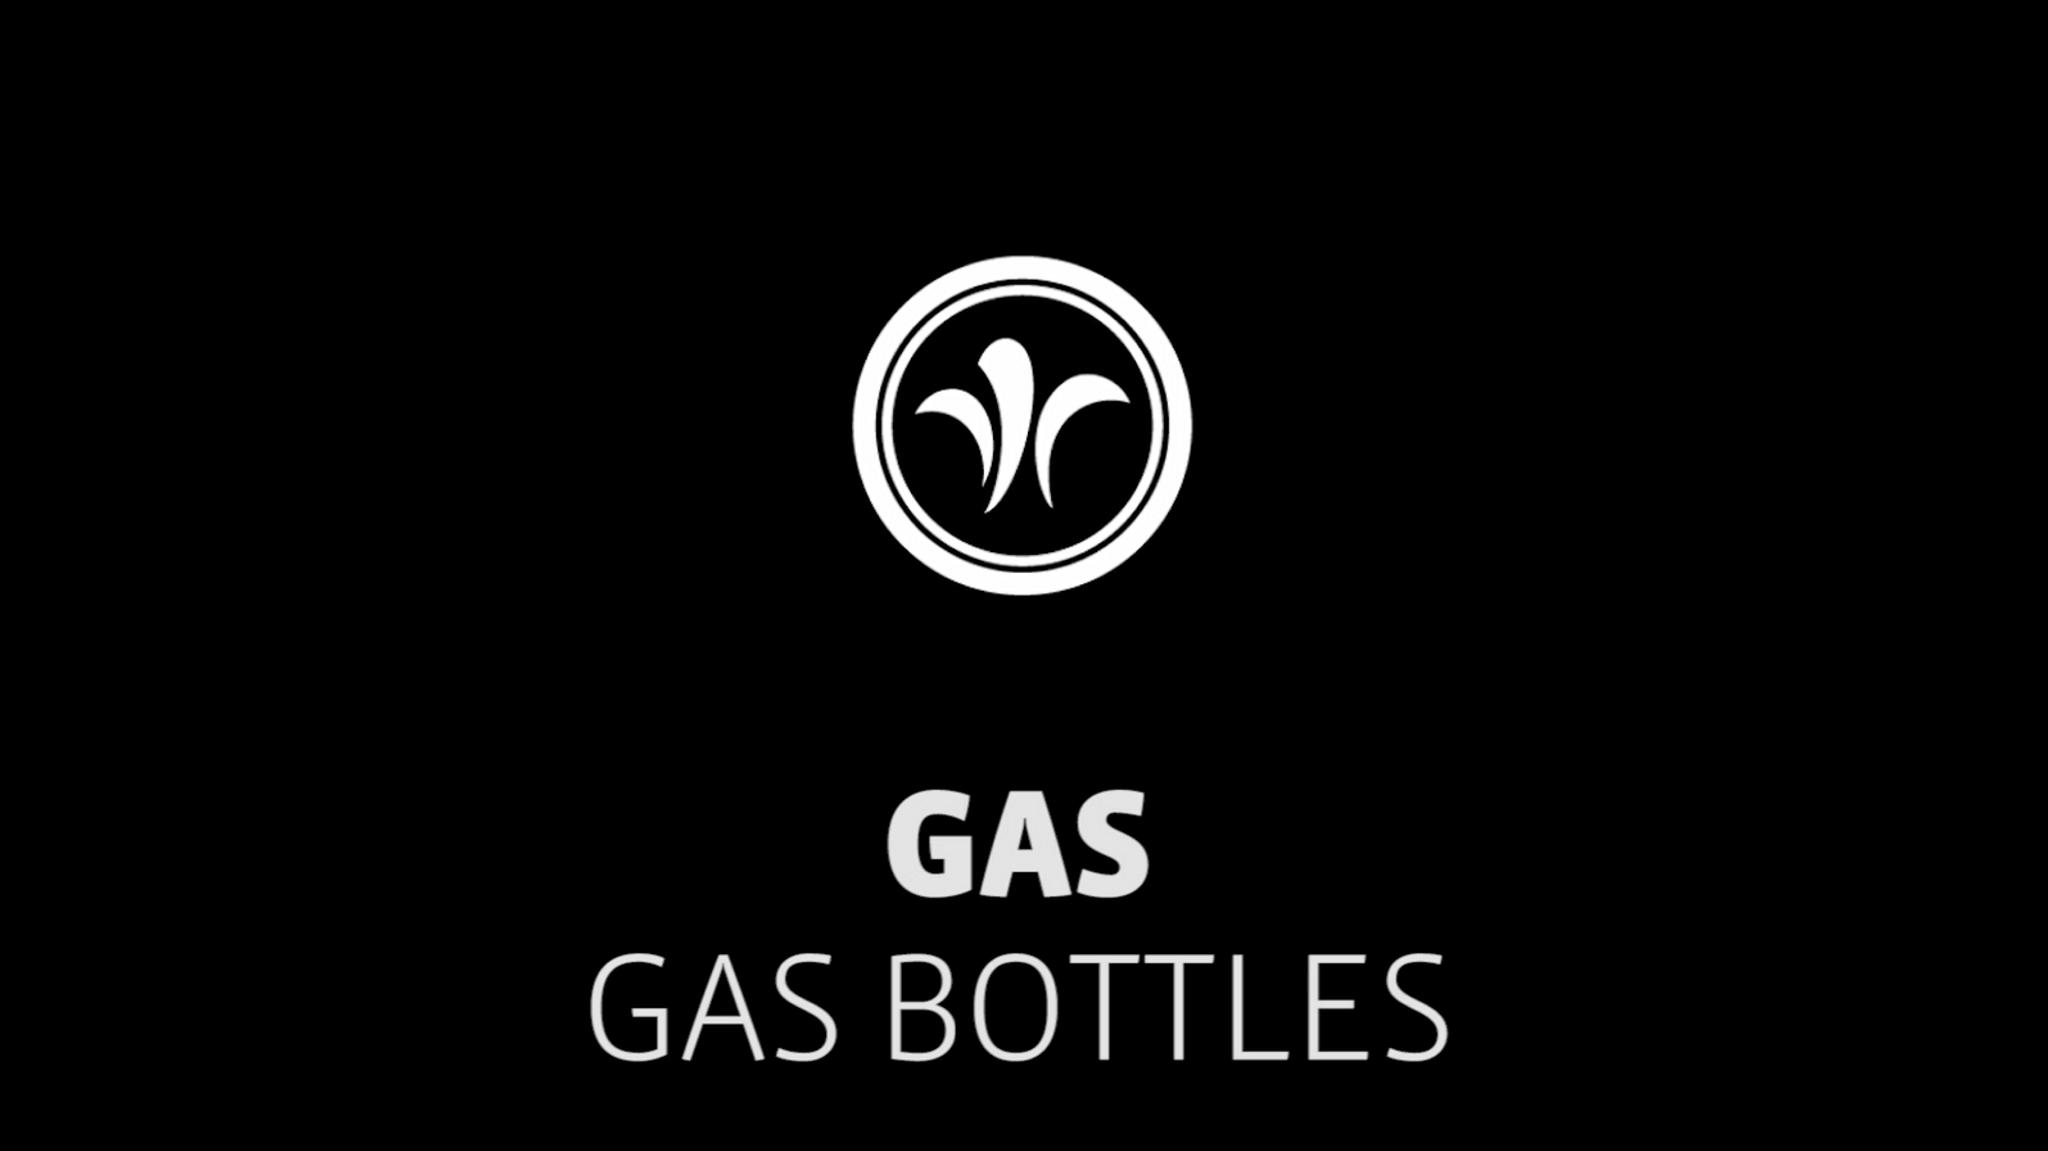 motorhome gas bottles // niesmann+bischoff - camper (model ARTO) // 2019 // G1